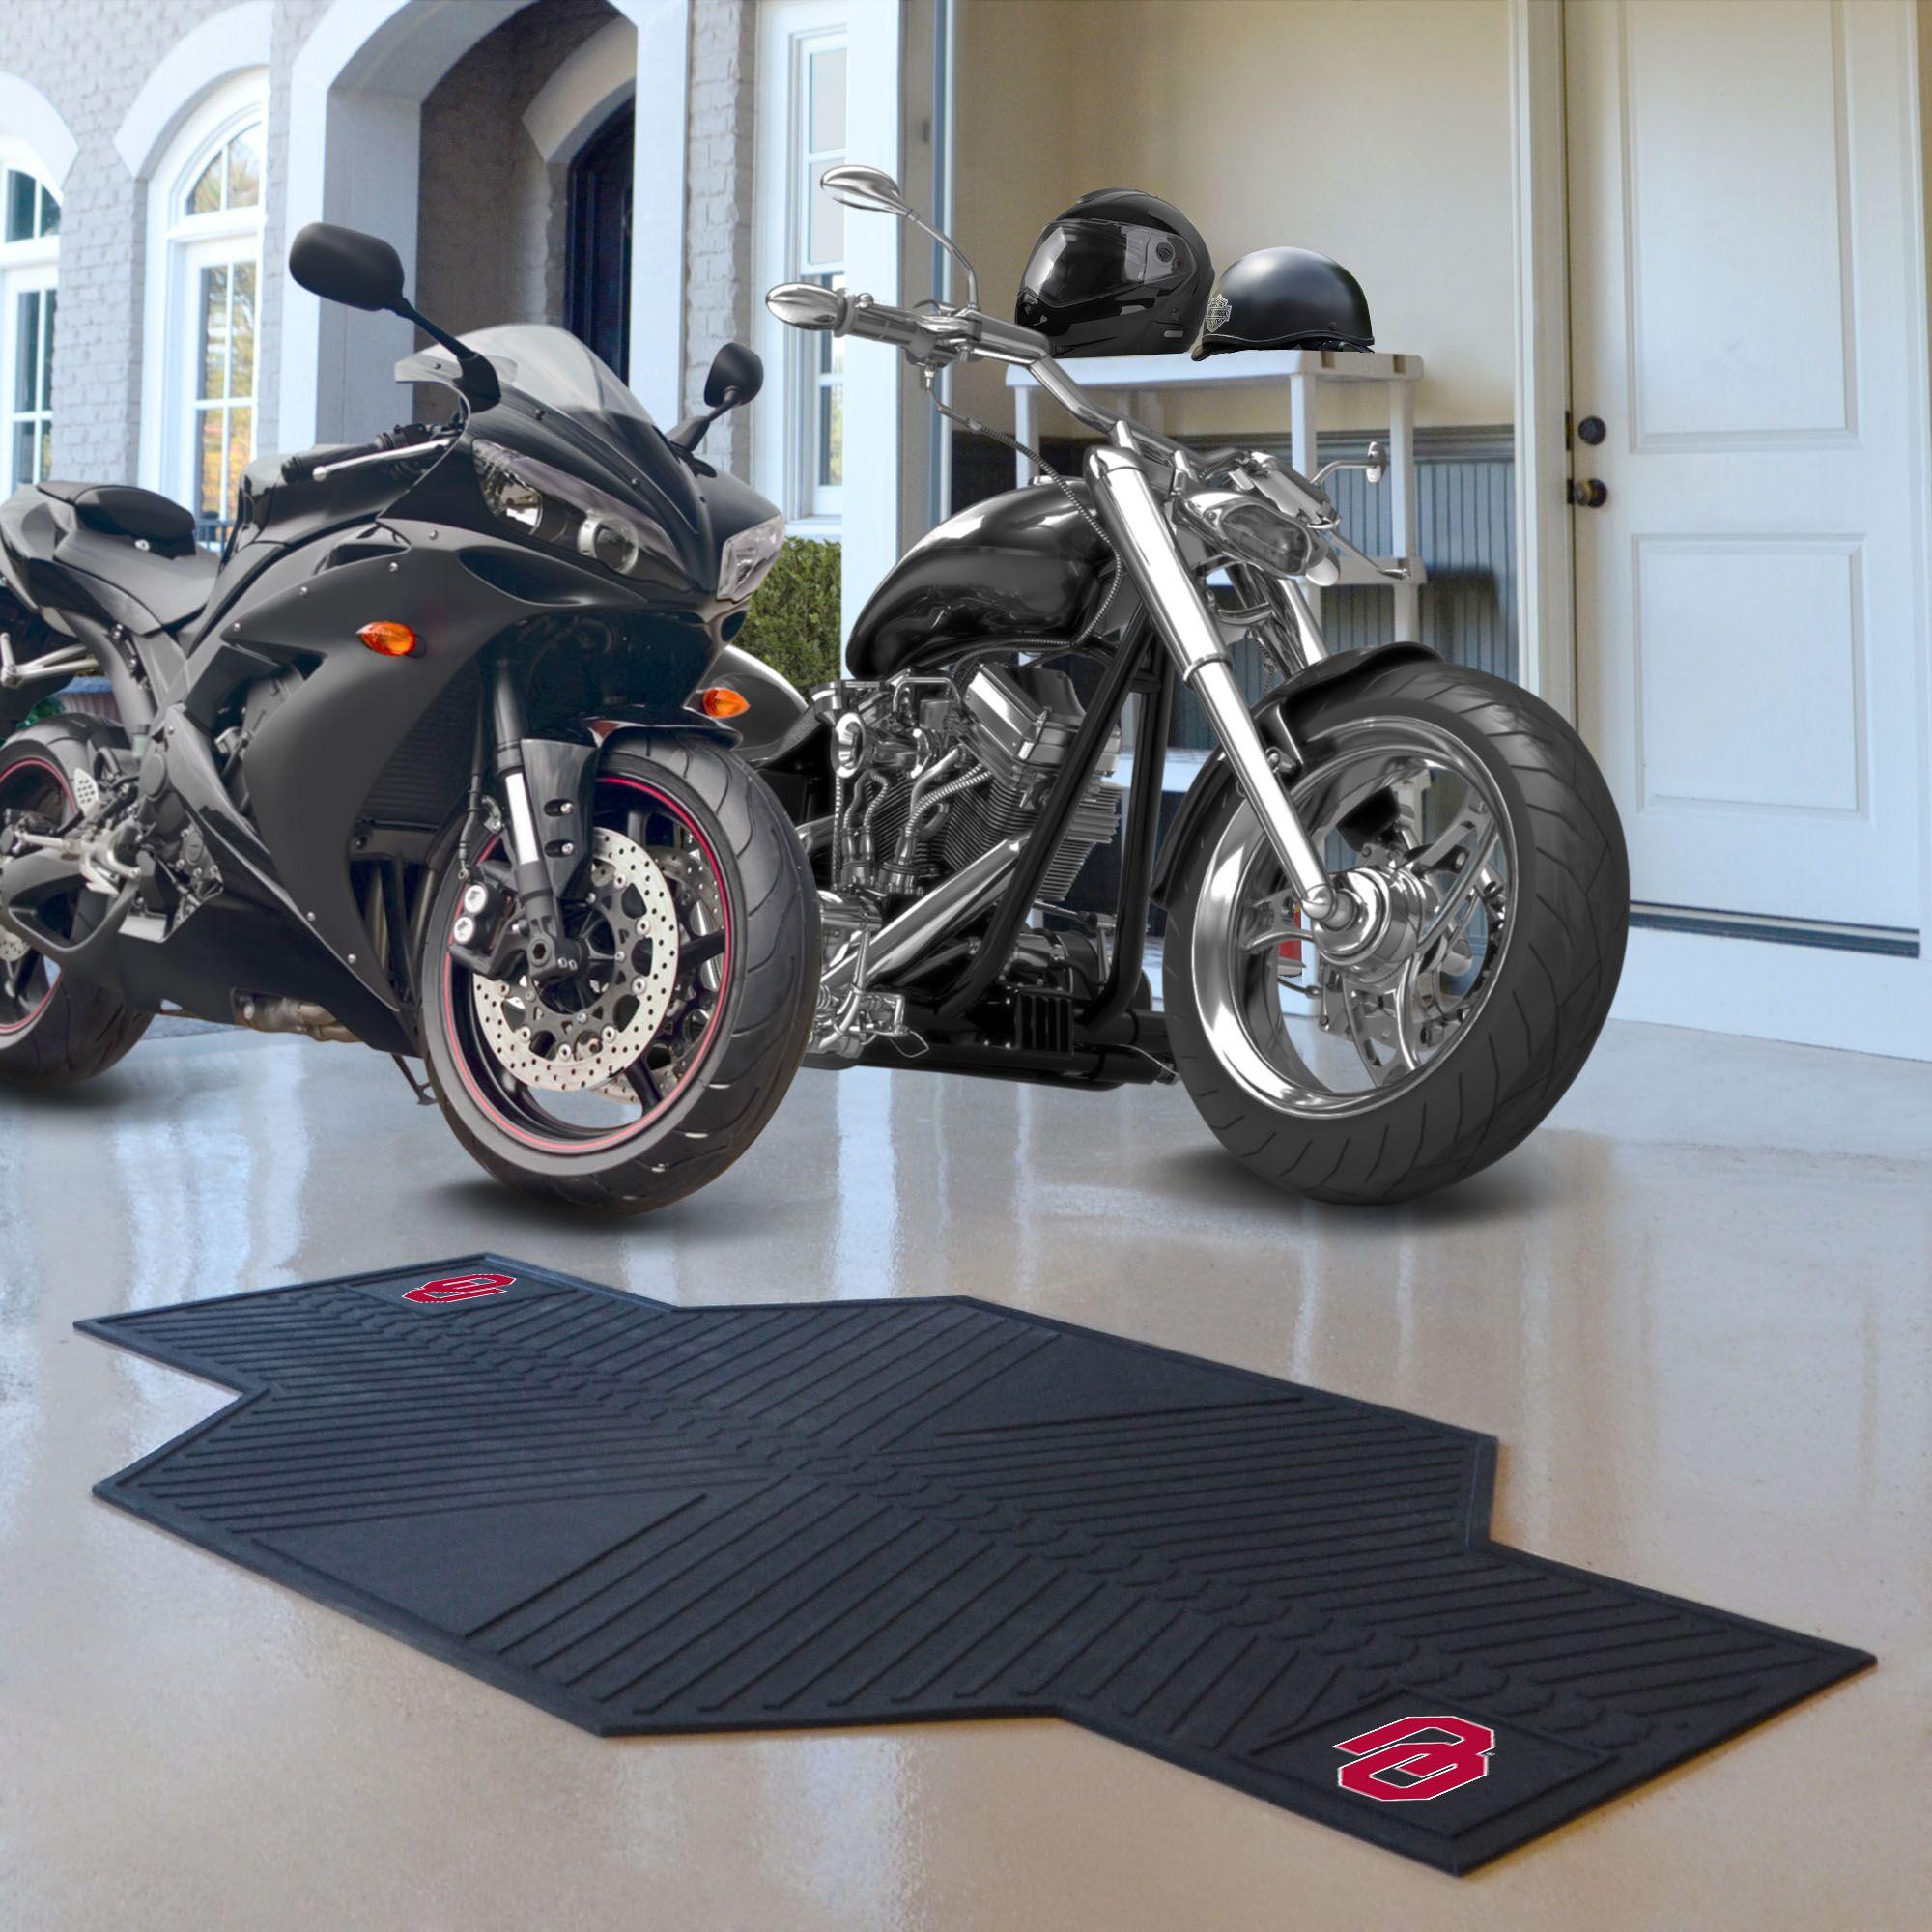 NCAA University of Oklahoma Motorcycle Motorcycle Utility Mat